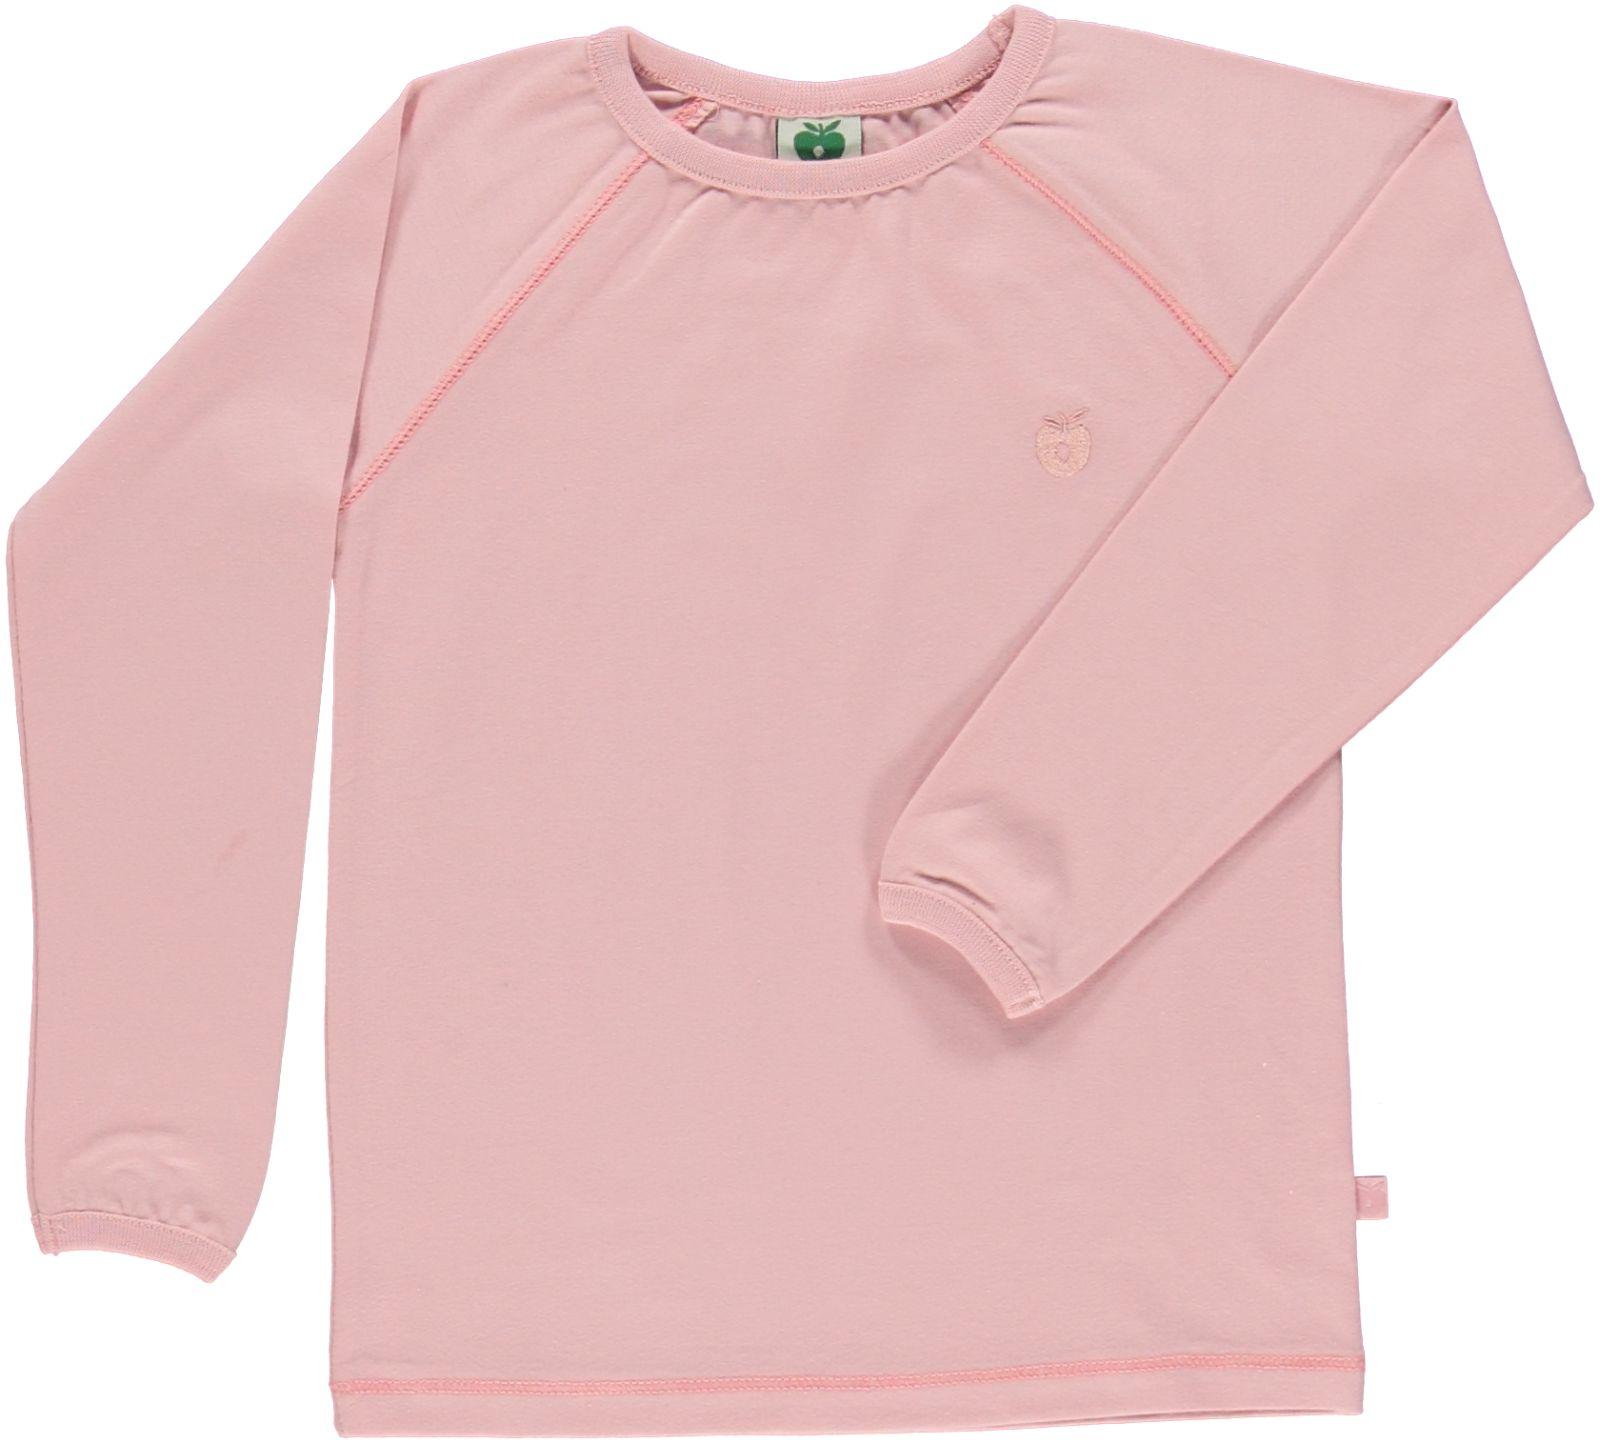 Småfolk - Organic Basic Longsleved T-Shirt - Silver Pink